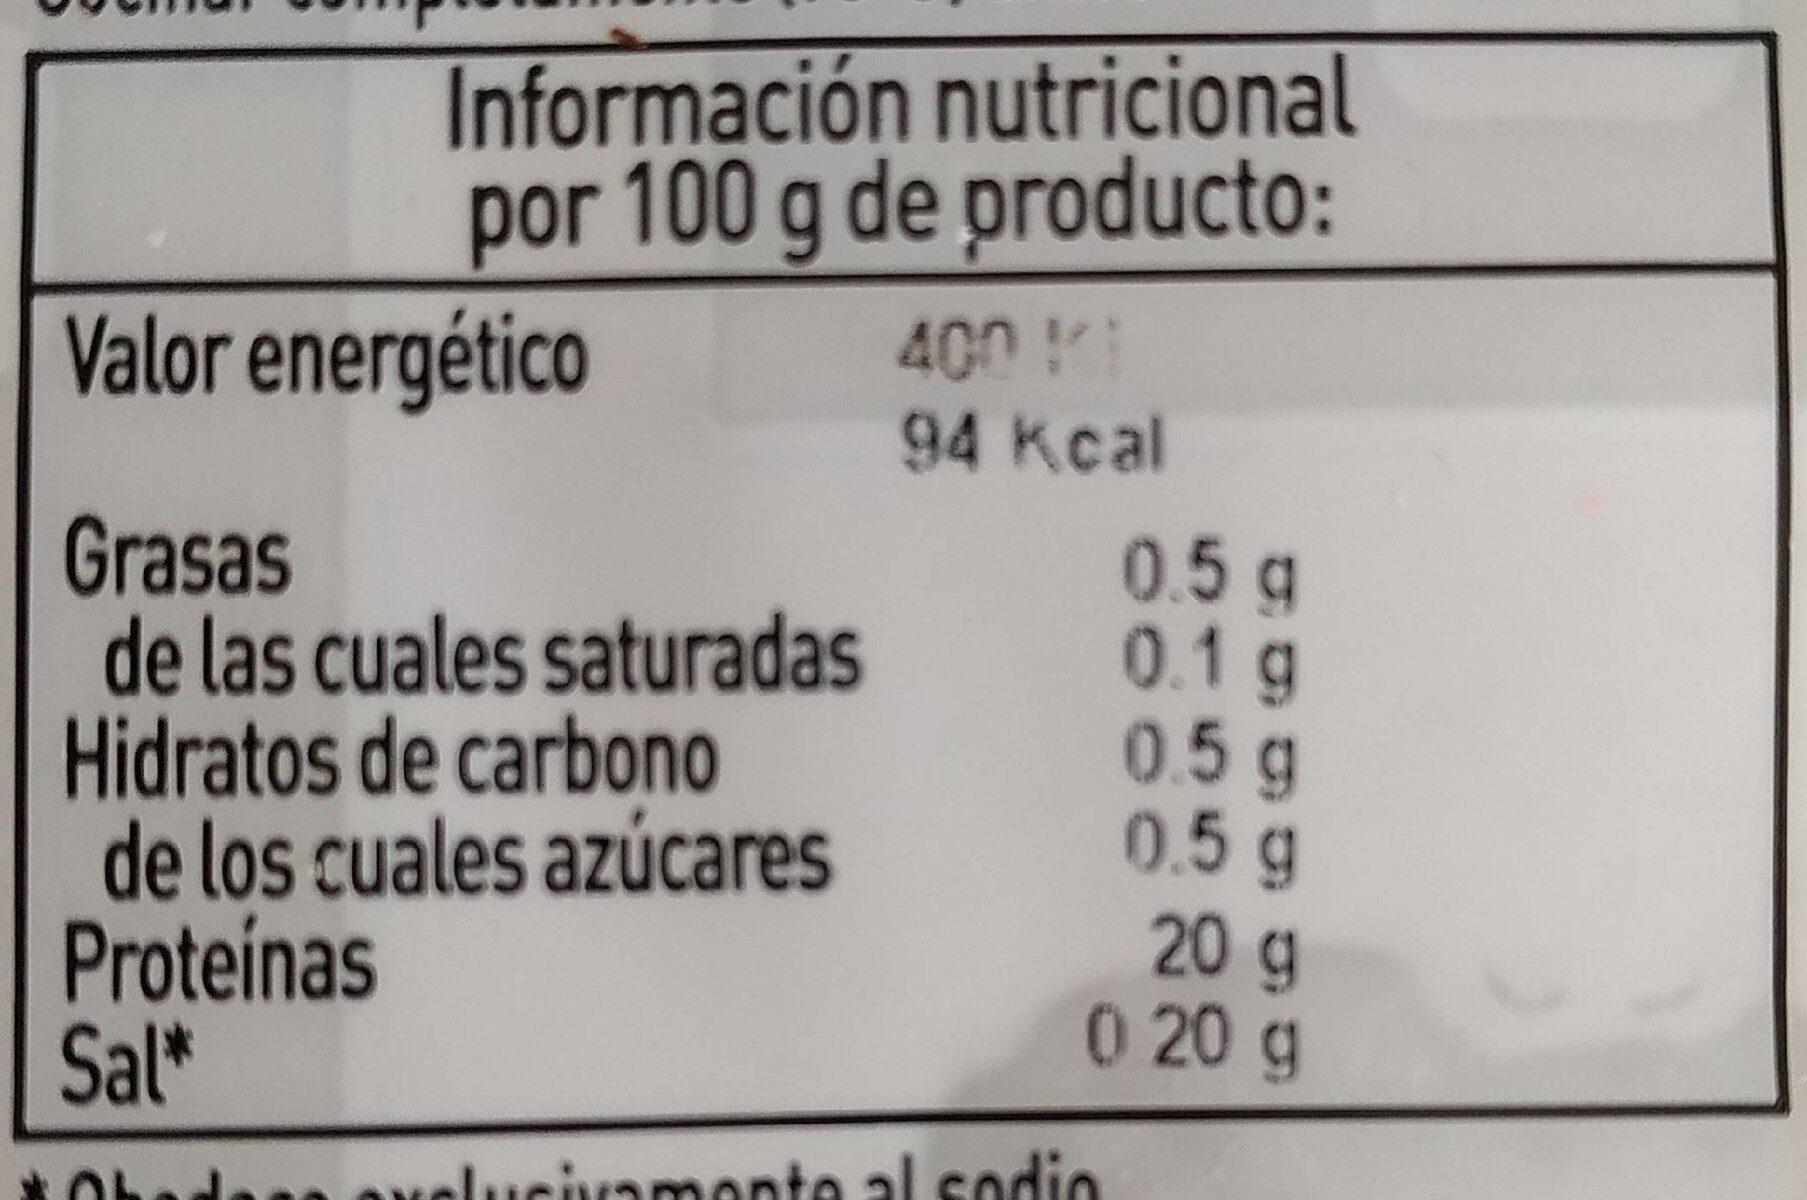 Informacion nutricional pechuga de pollo